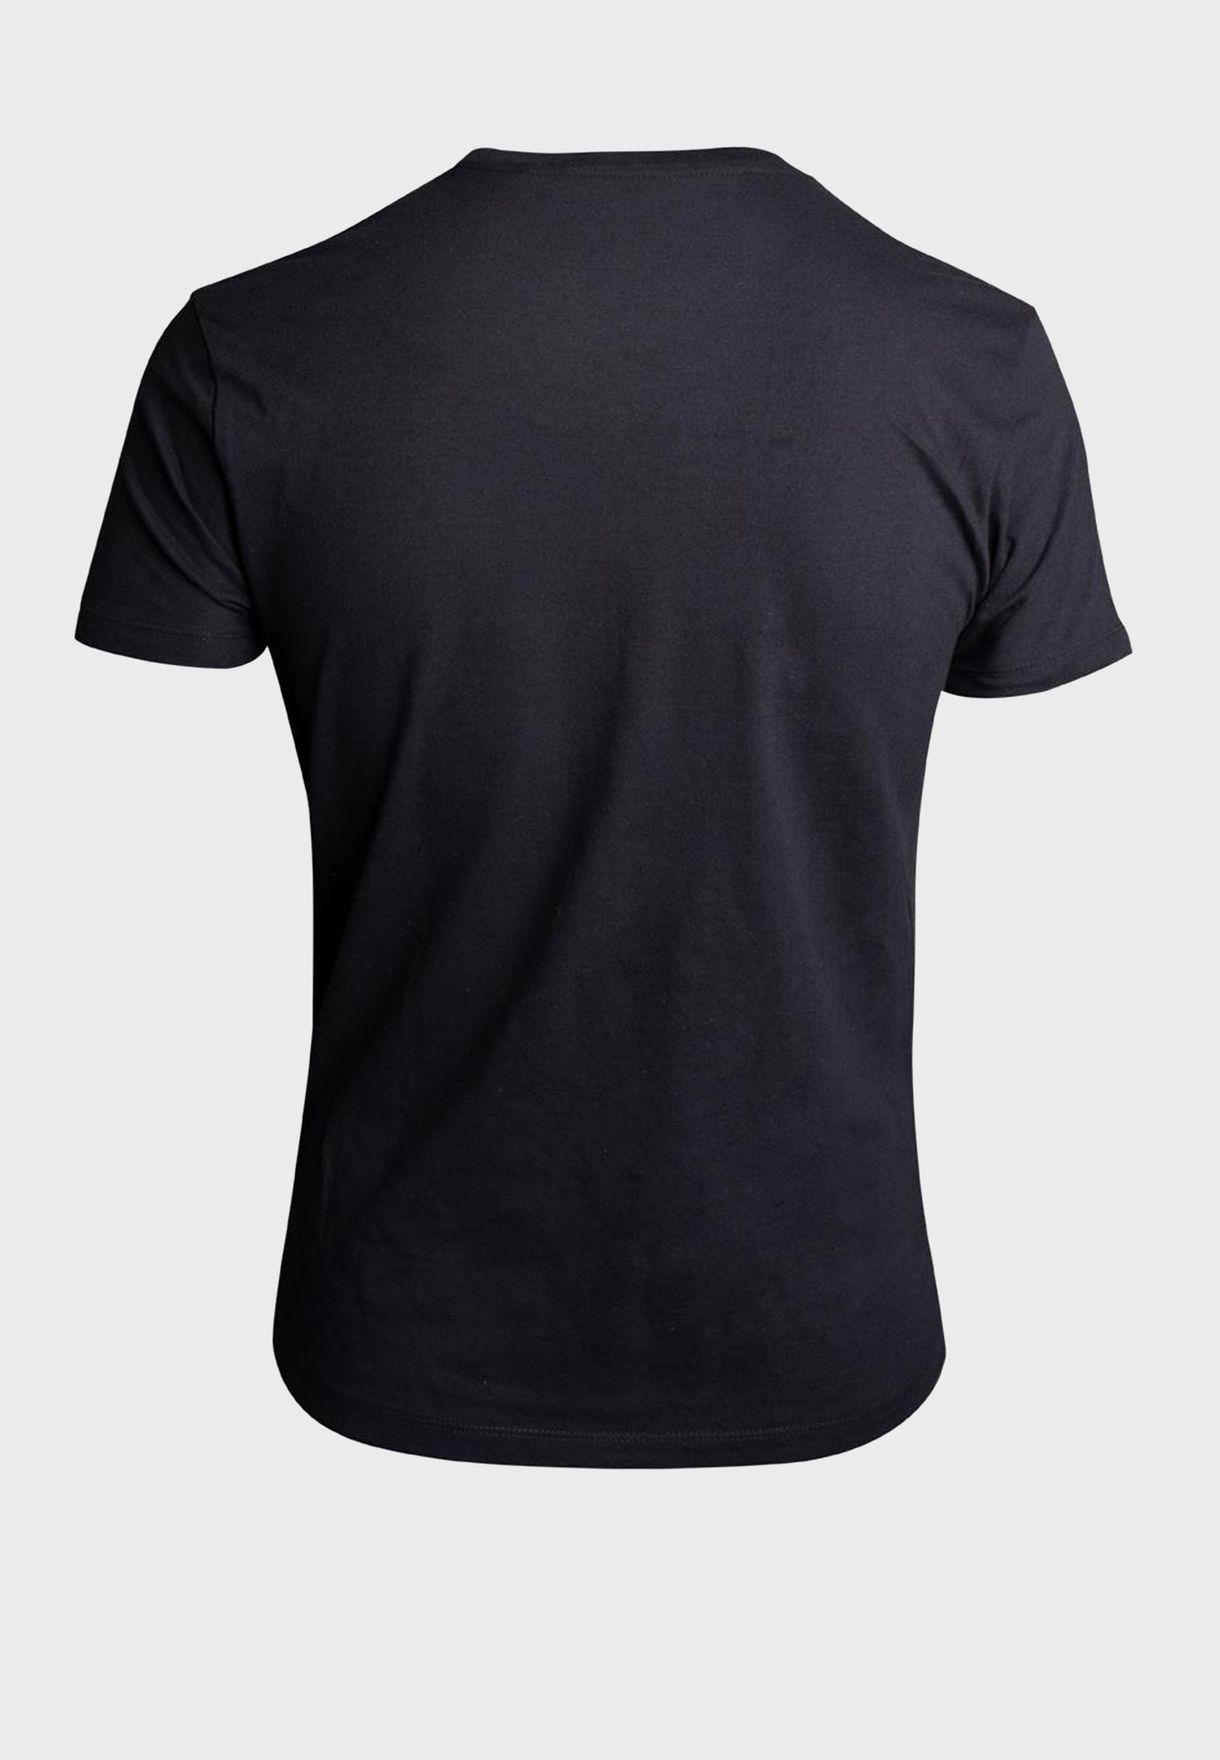 Nintendo Bowser Squad Crew Neck T-Shirt